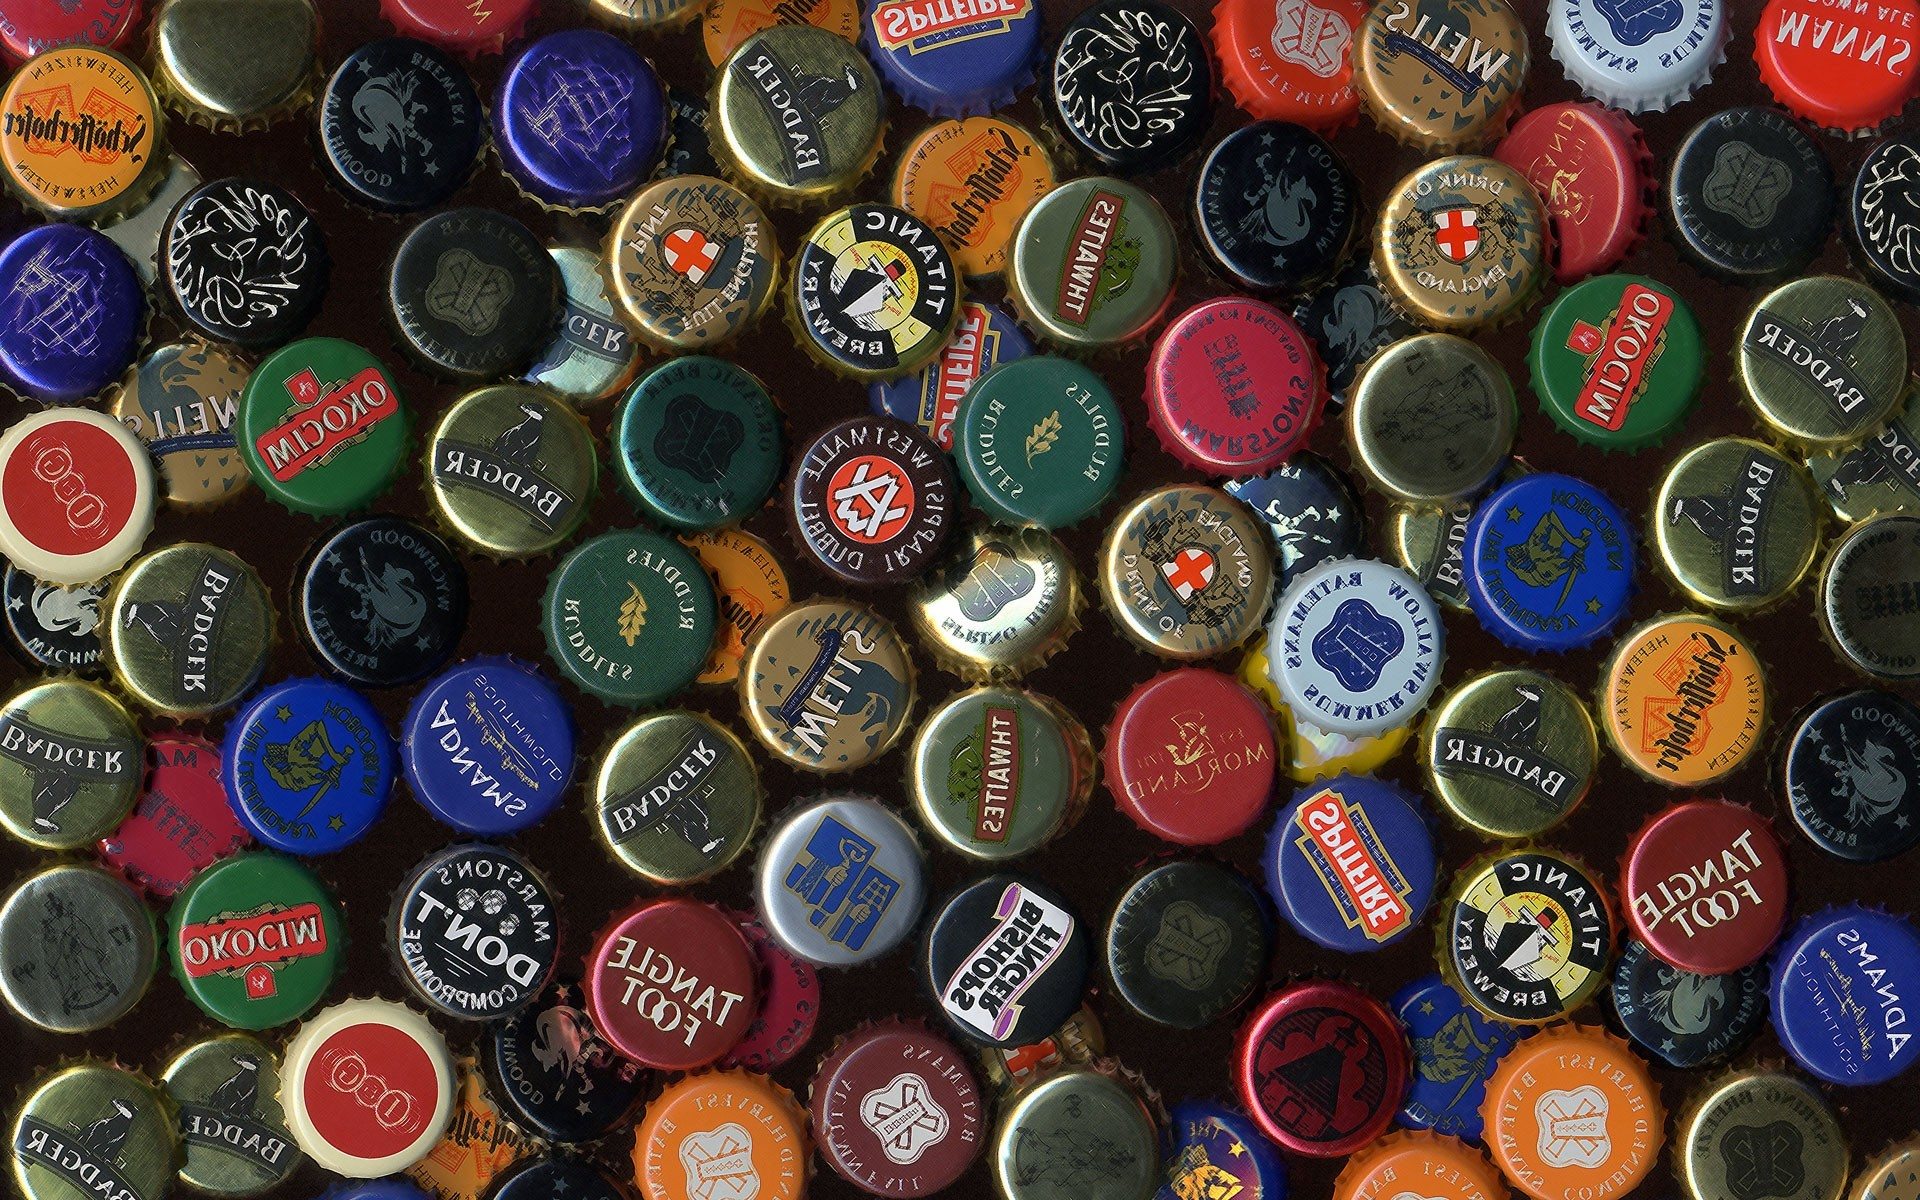 Beer Bottle Caps Backgrounds, Compatible - PC, Mobile, Gadgets| 1920x1200 px